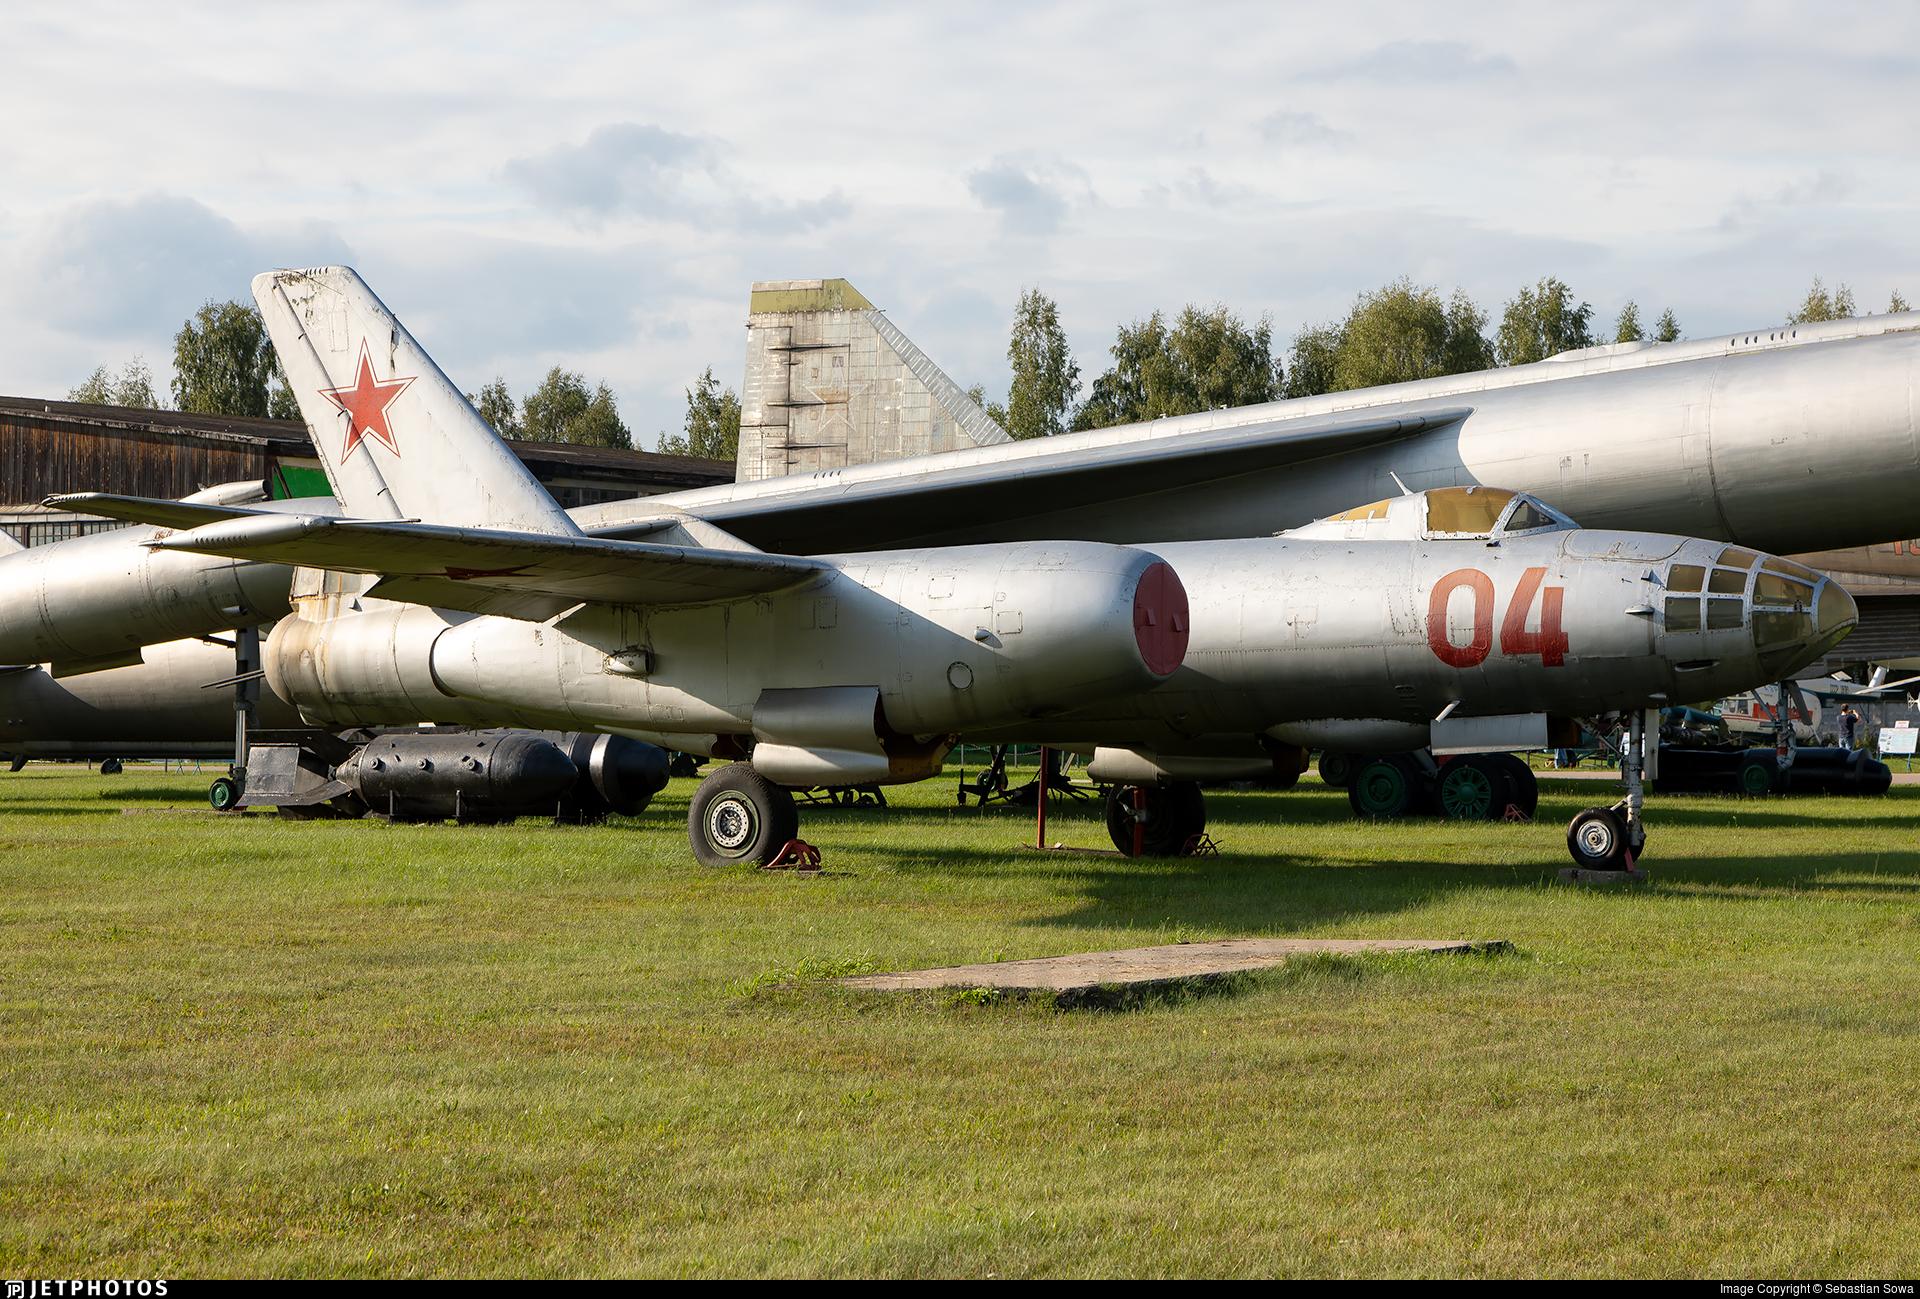 04 - Ilyushin IL-28 Beagle - Soviet Union - Air Force